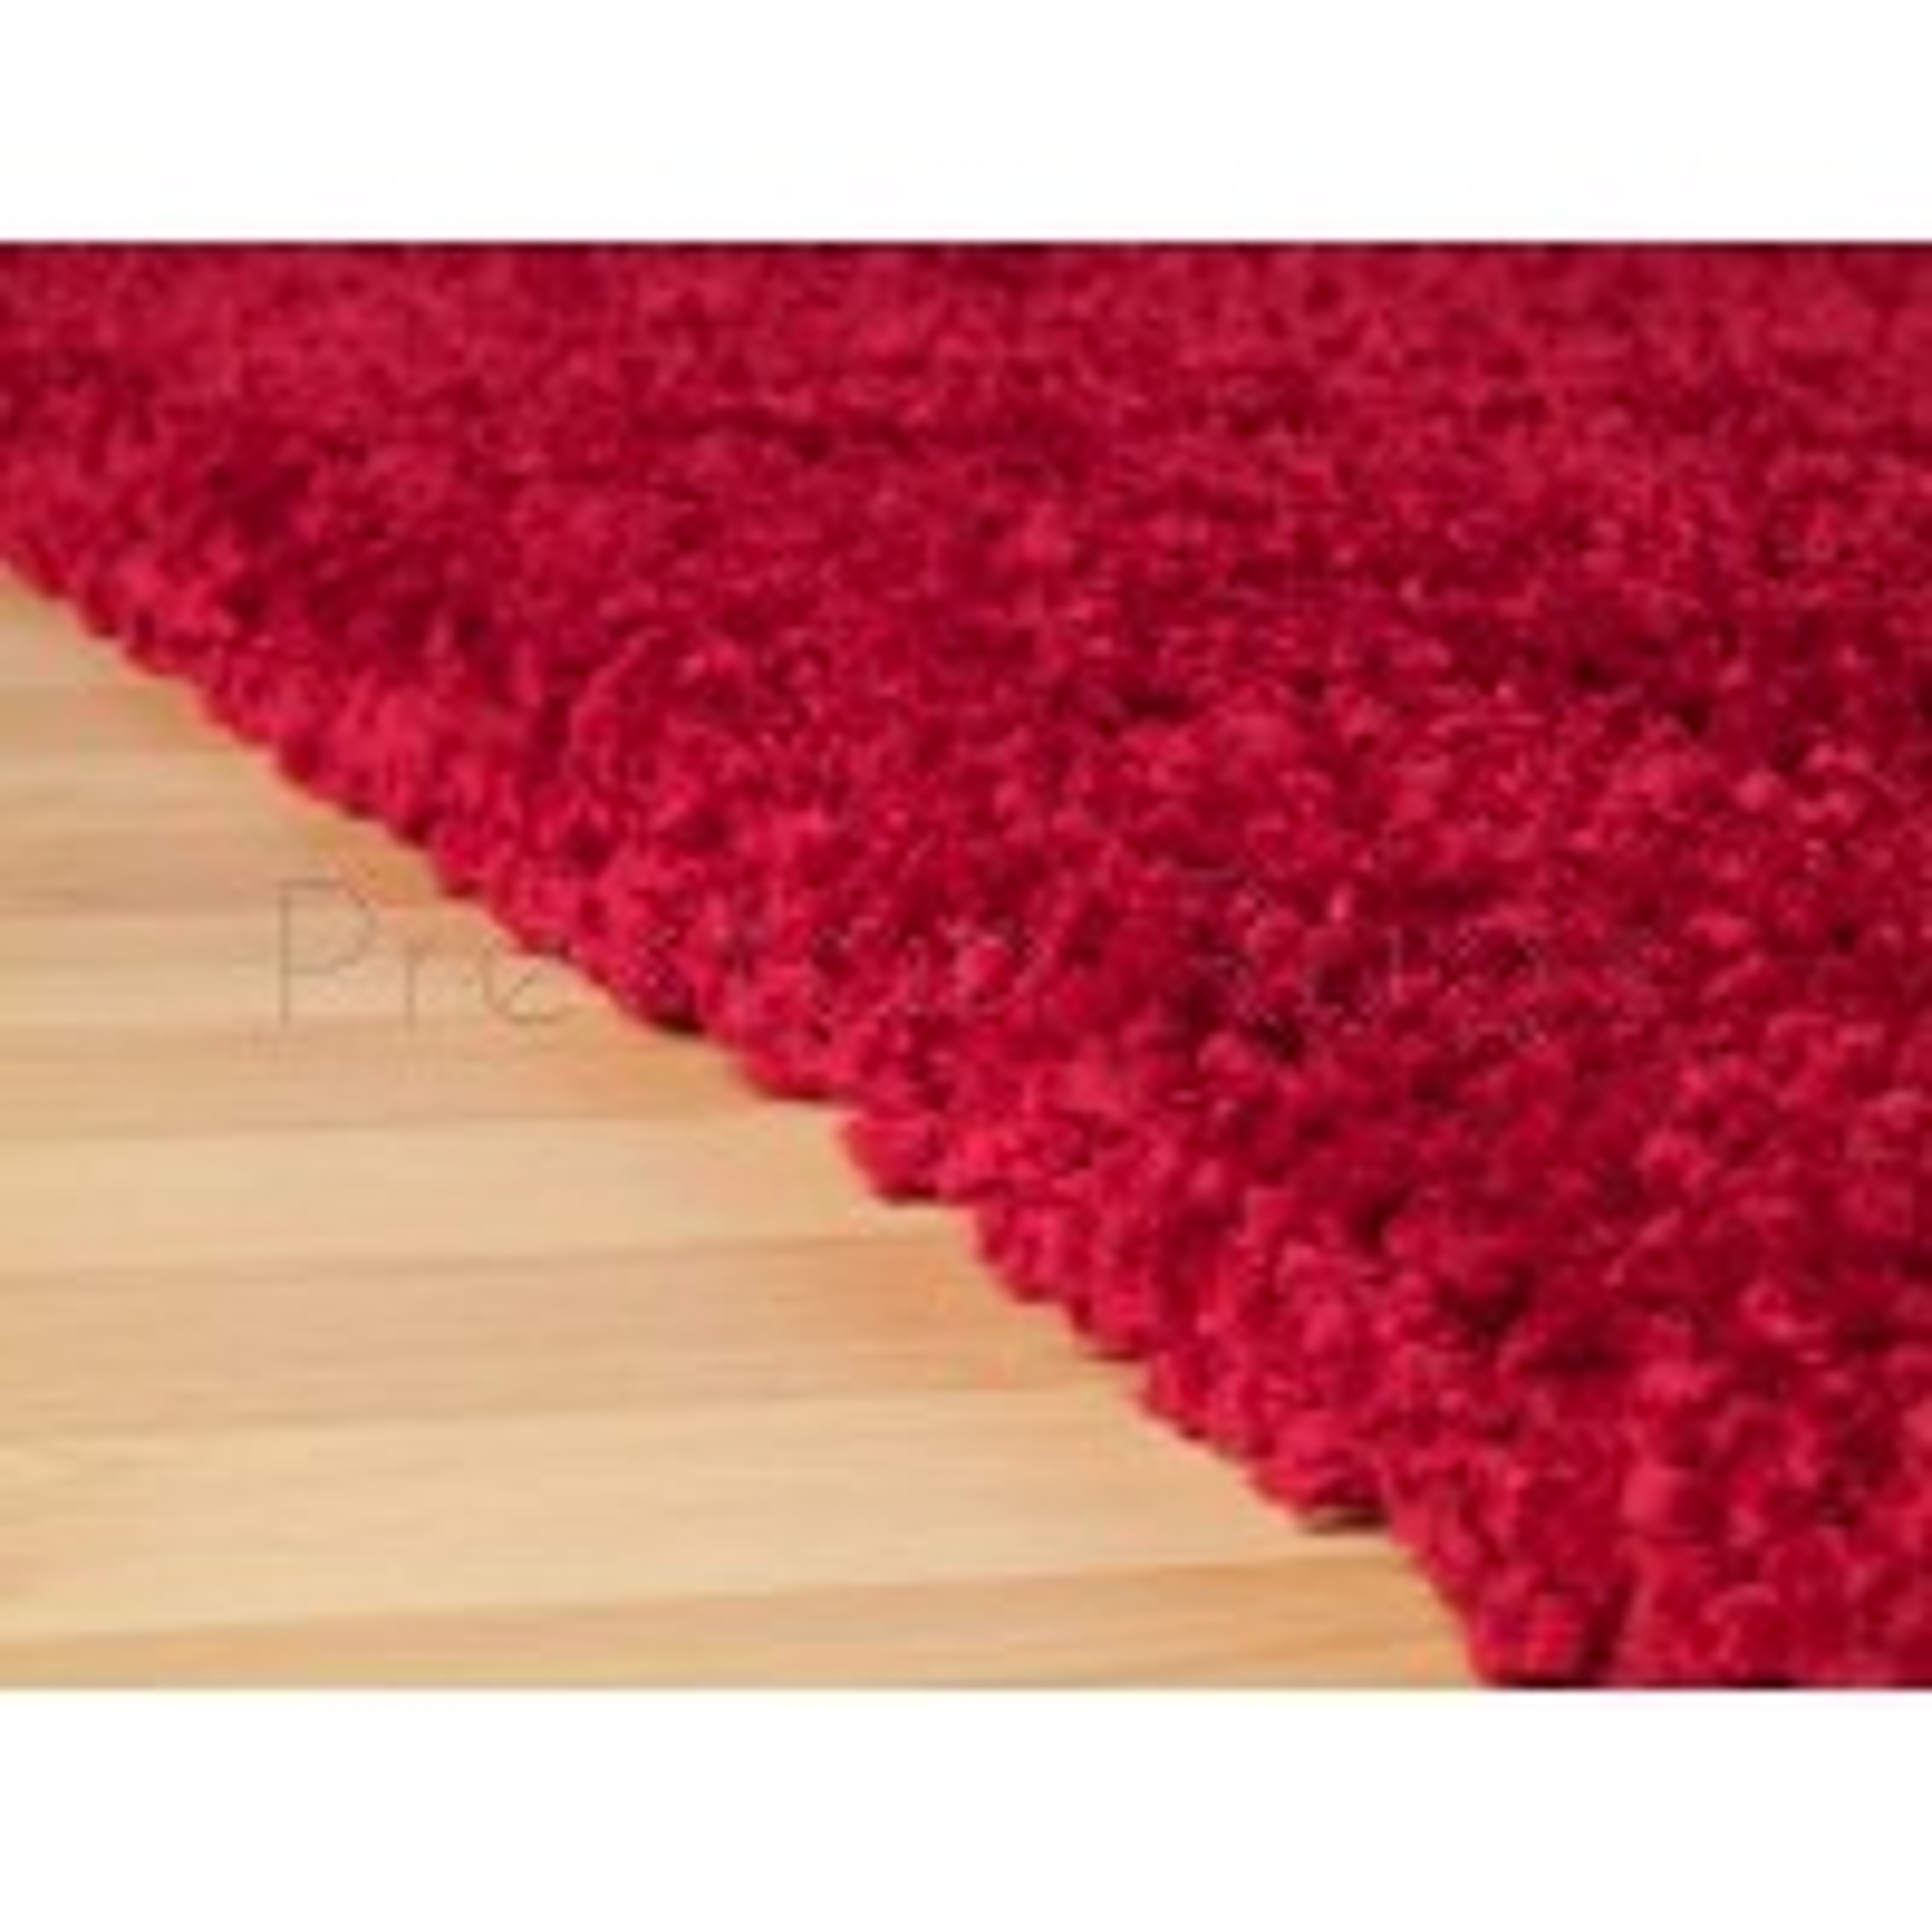 "Harmony Shaggy Rug - Red-60 x 120 cm (2' x 3'11"")"